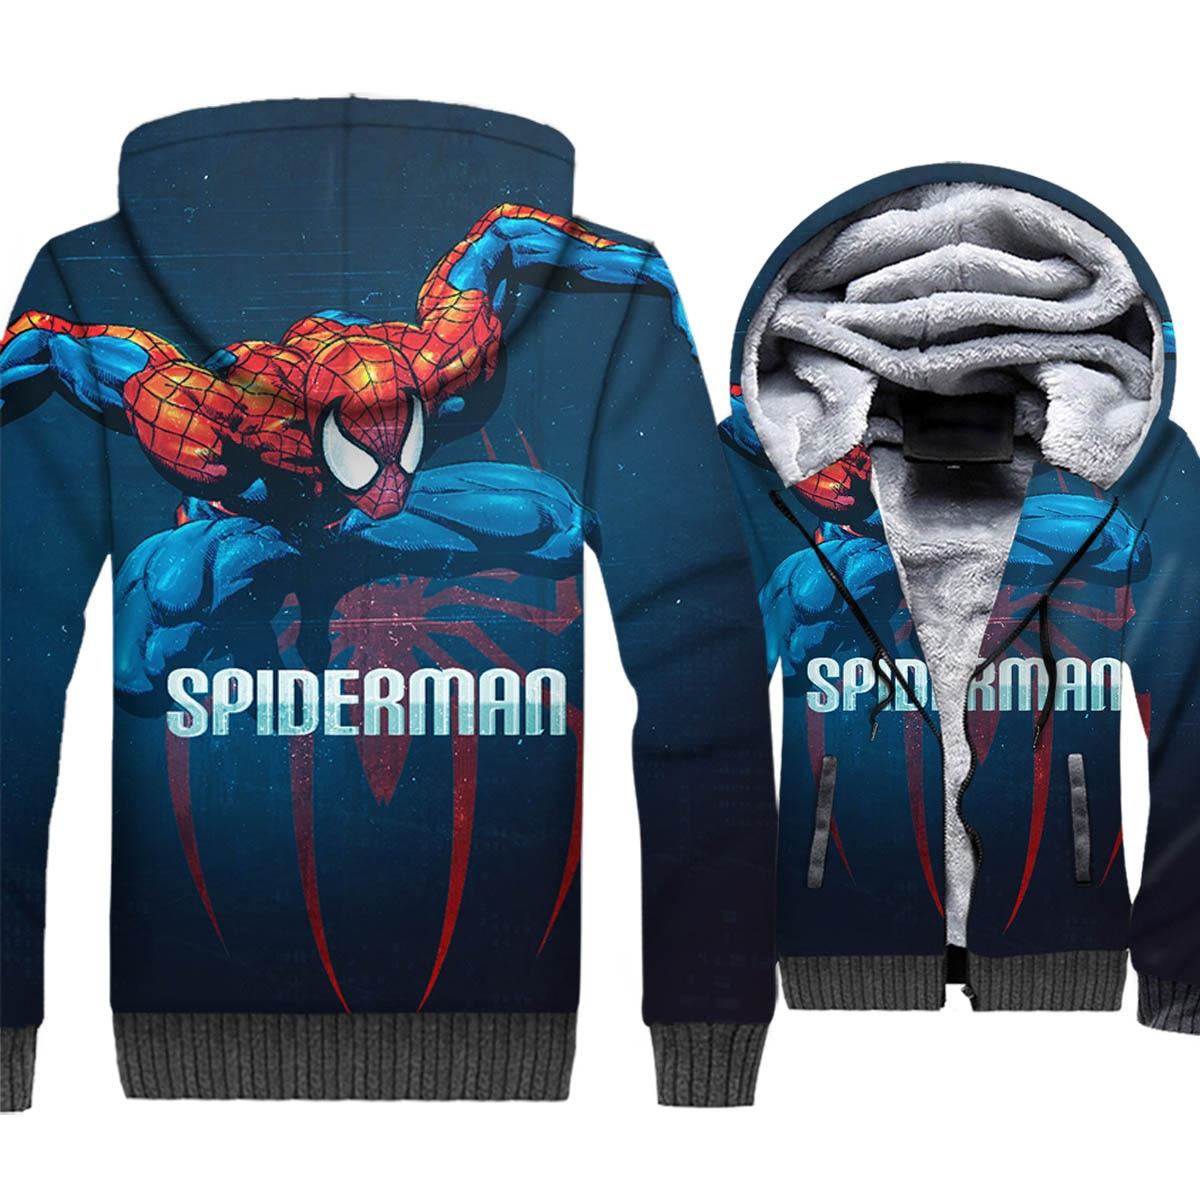 Men's Sportswear 3D Hoody 2018 Autumn Winter Thick Zipper Jackets Superhero Spiderman Hoodies Men Hip Hop Streetwear Sweatshirts